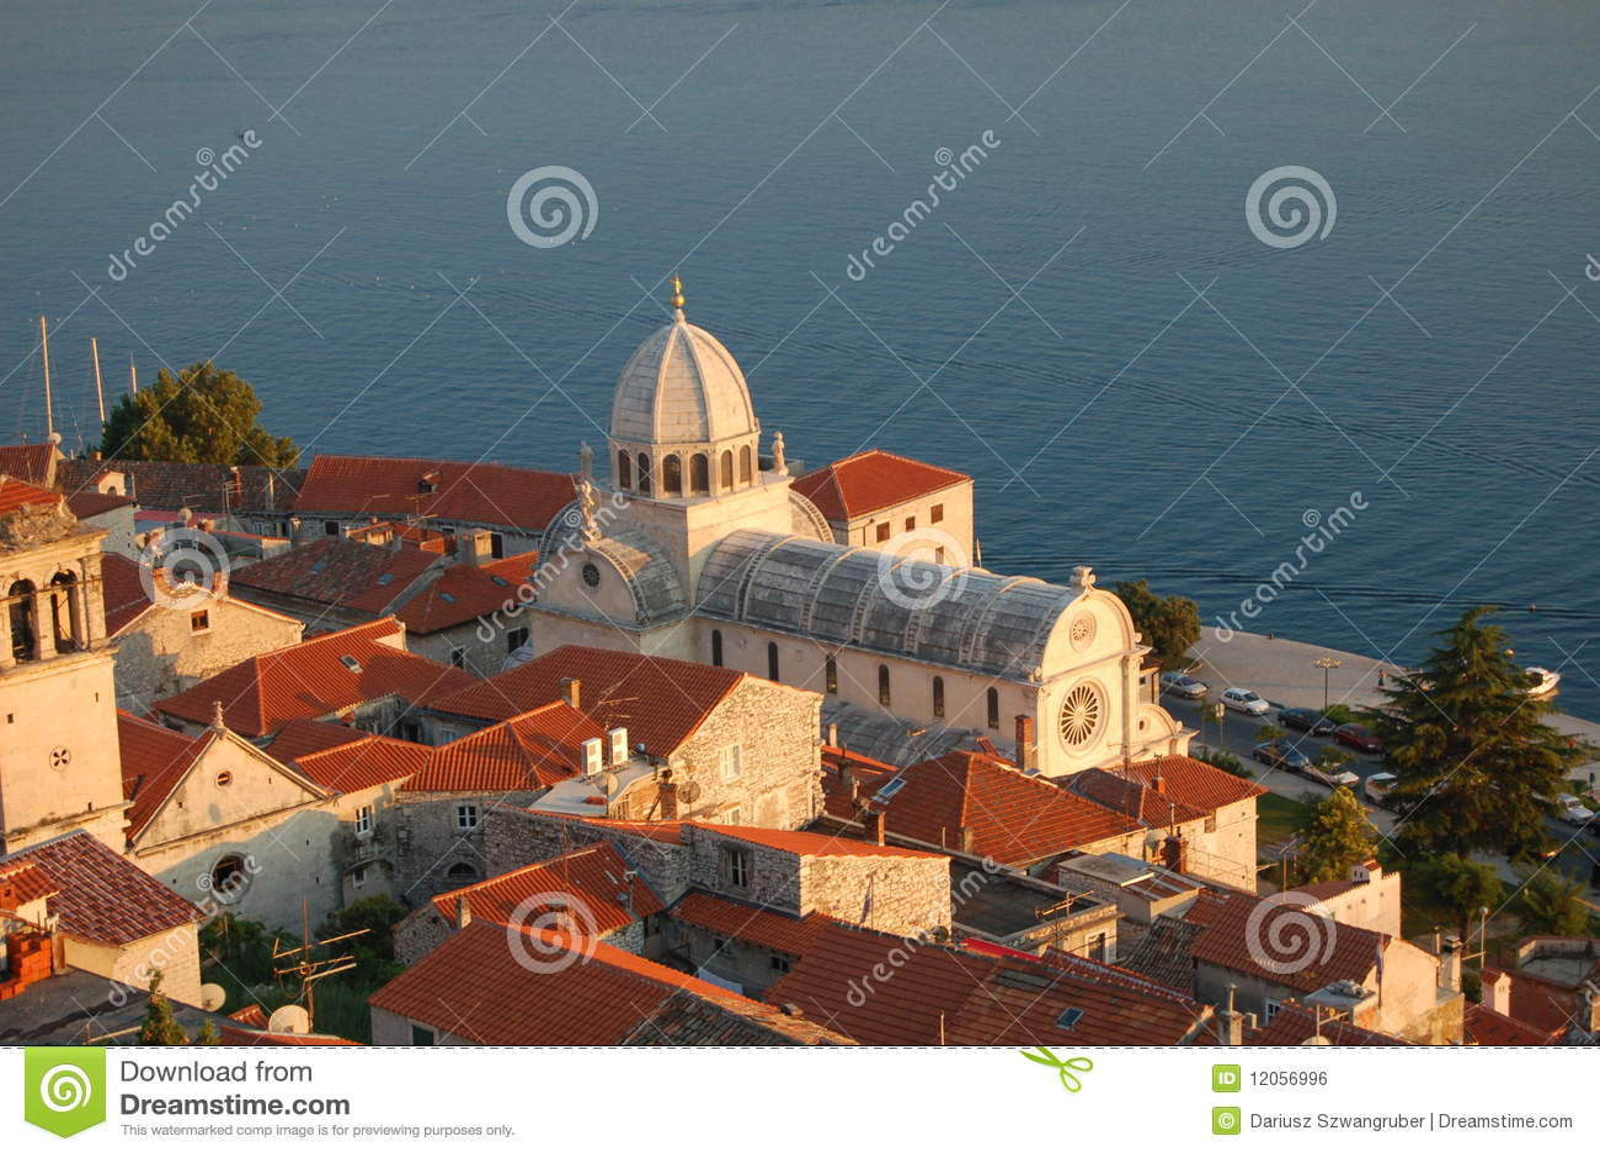 St. James Basilica in Sibenik